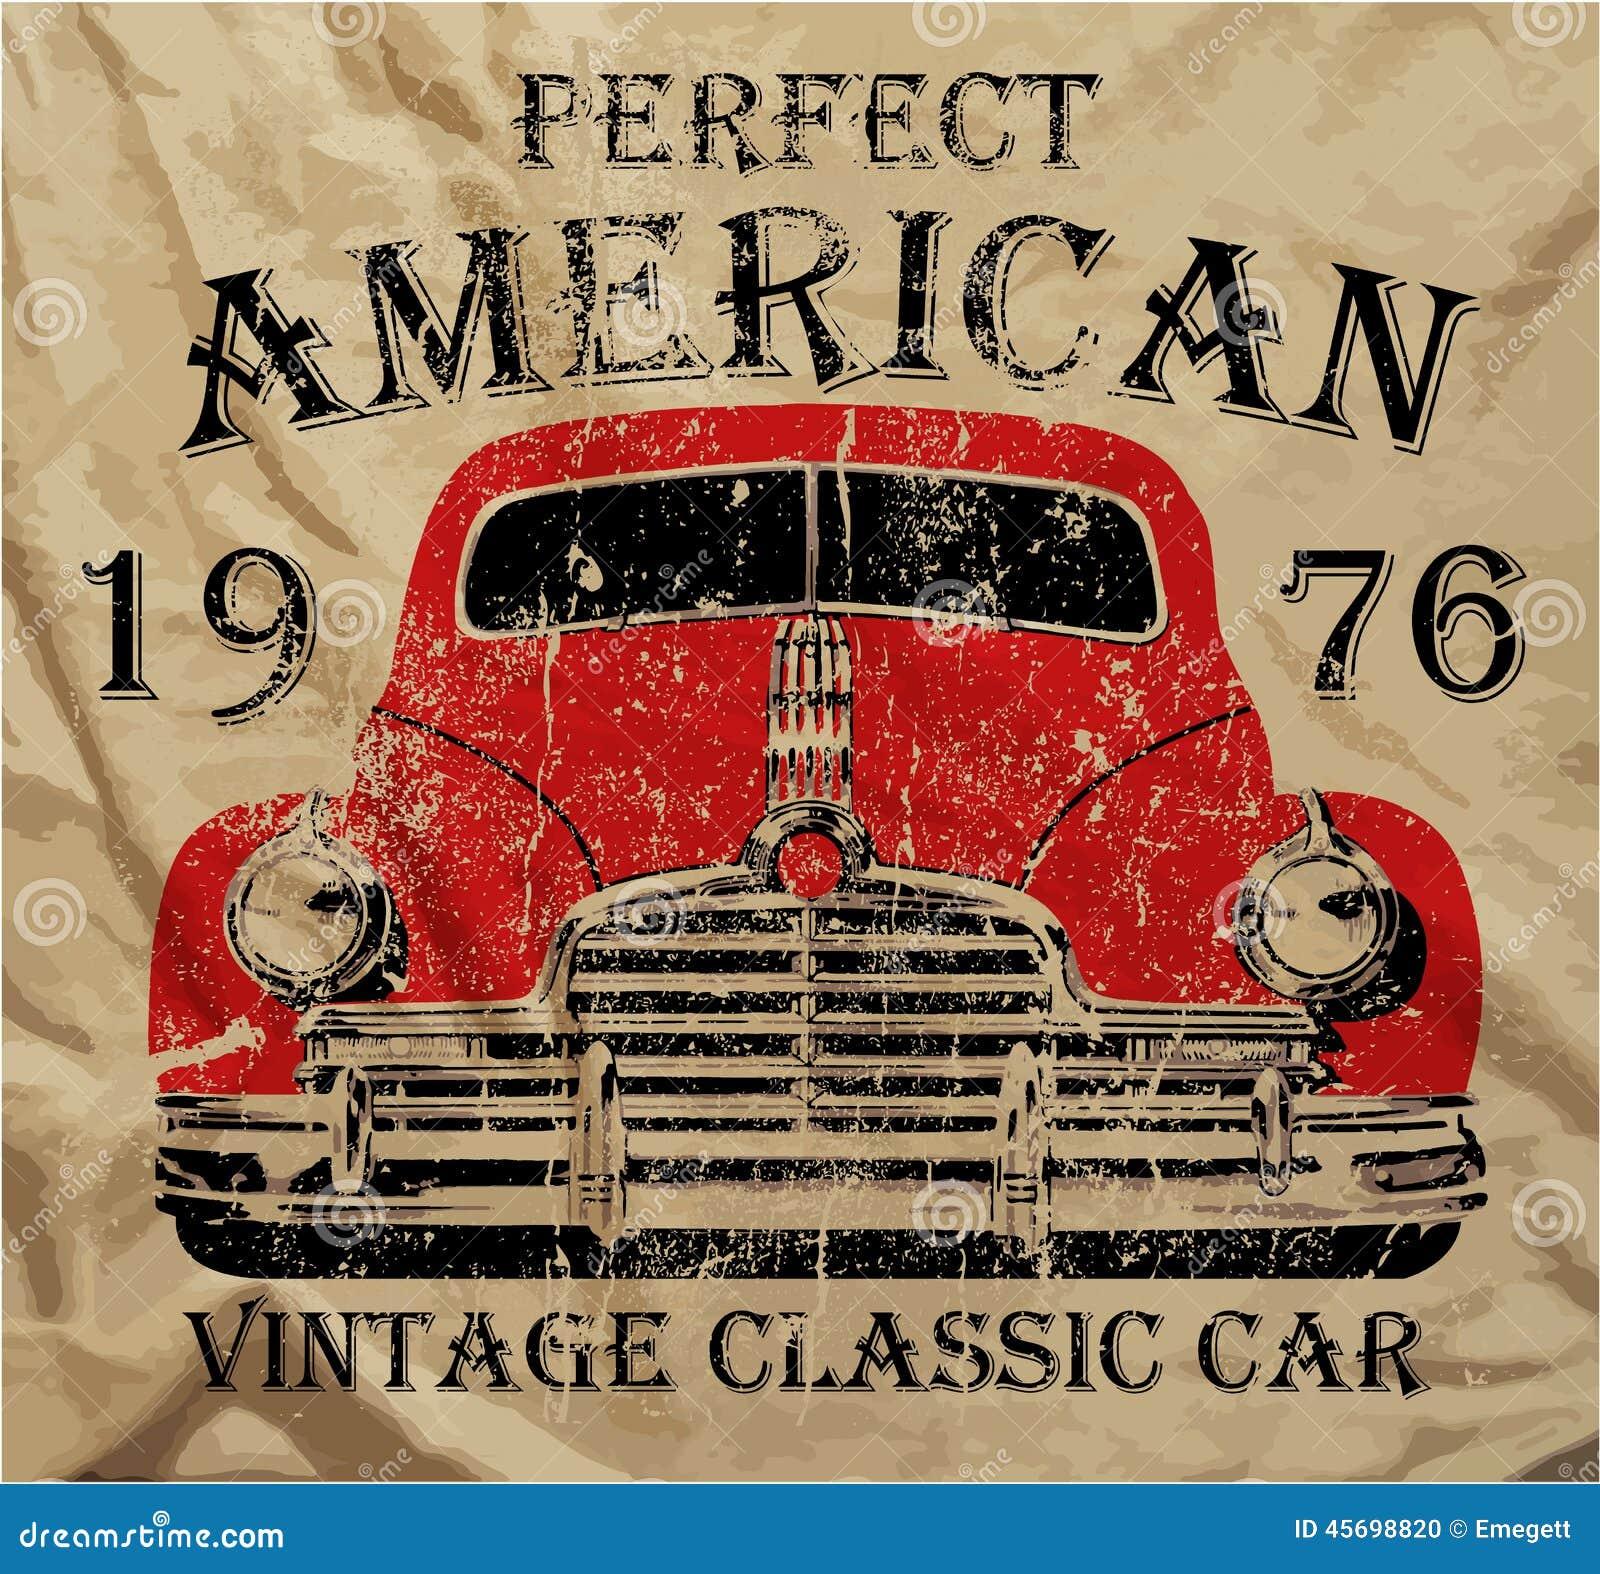 Shirt design vintage - Old American Car Vintage Classic Retro Man T Shirt Graphic Design Stock Photo